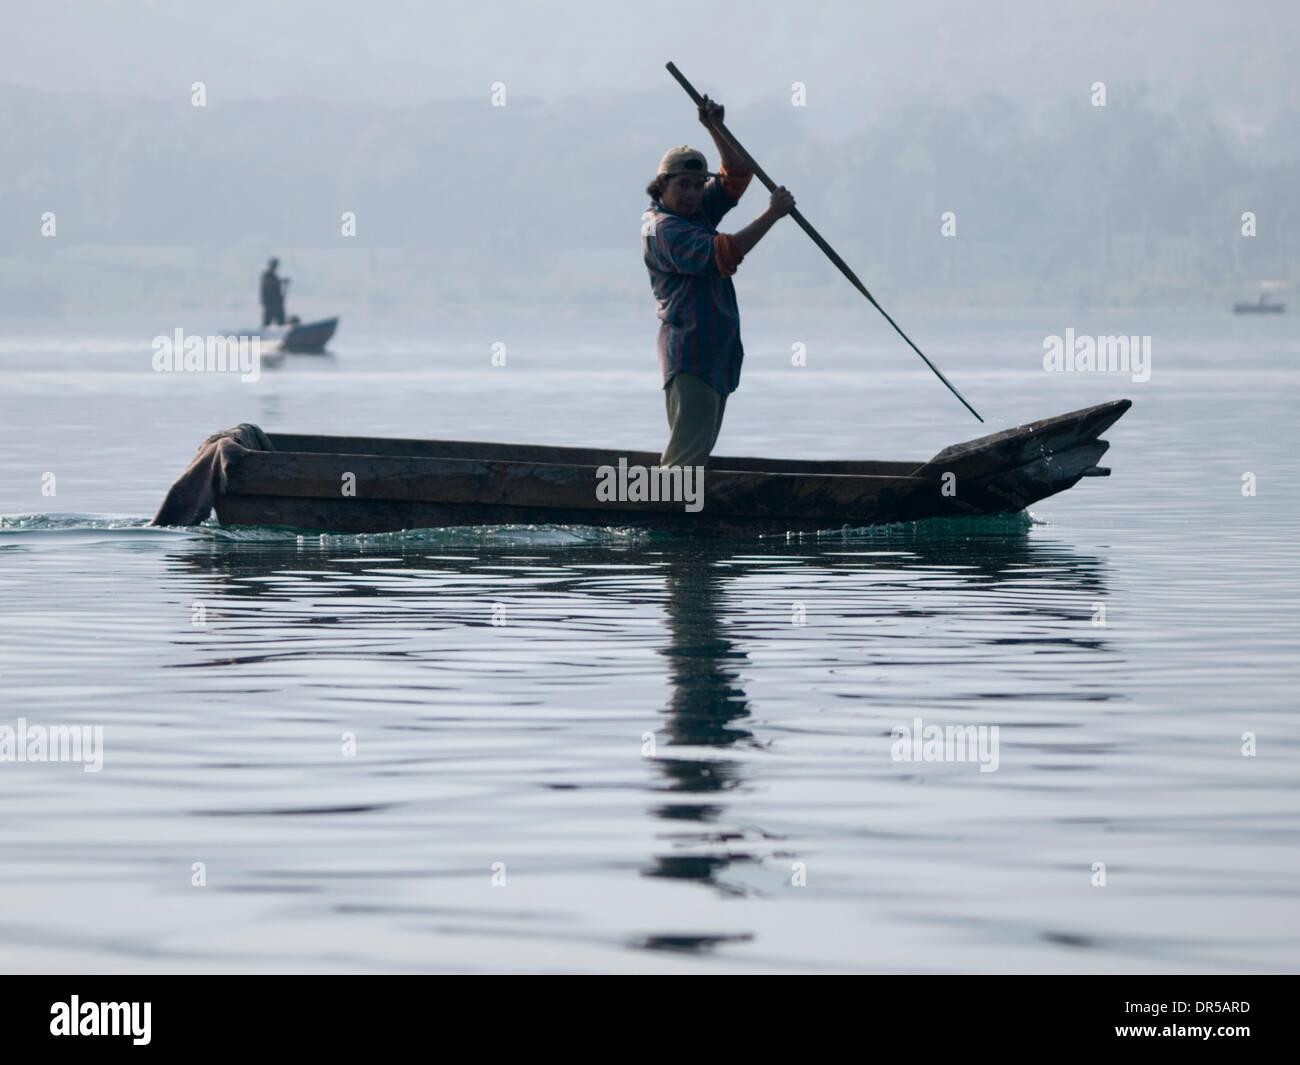 Mar 29, 2009 - Santiago Atitlan, Solola, Guatemala - Fishermen at work on Lake Atitlan in Santiago Atitlan, Solola, Stock Photo